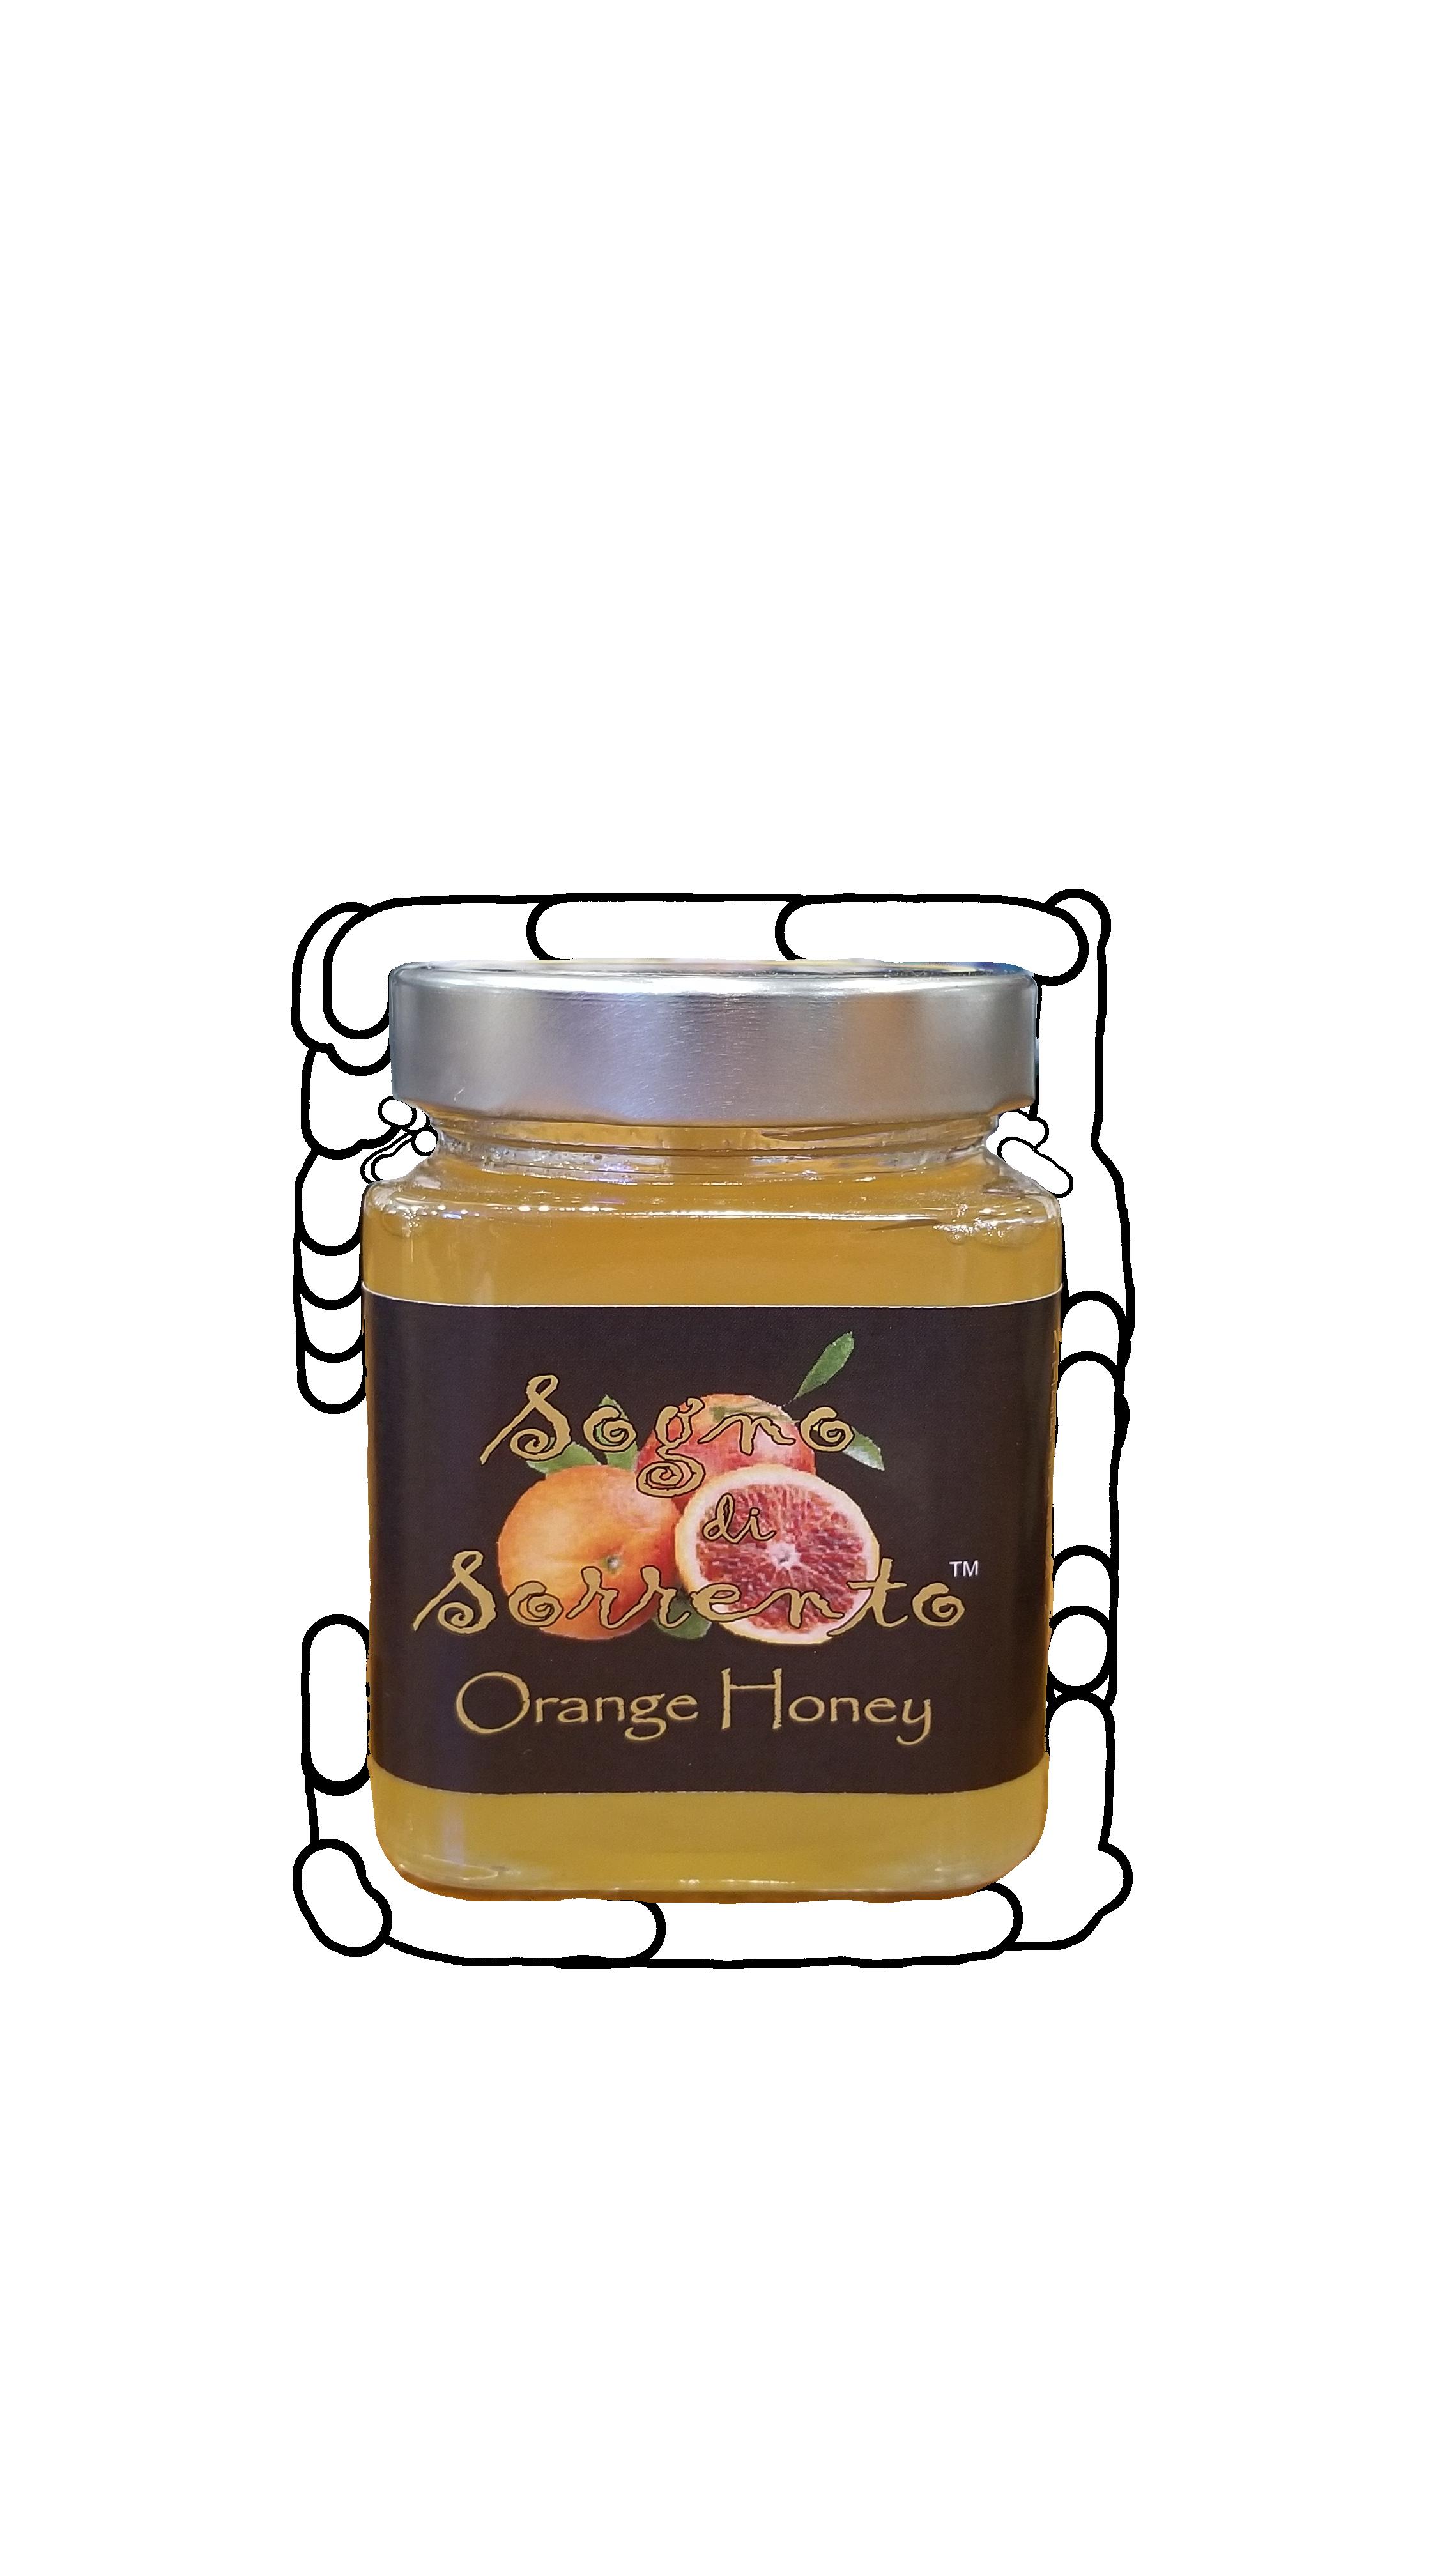 Sogno Orange Honey.png